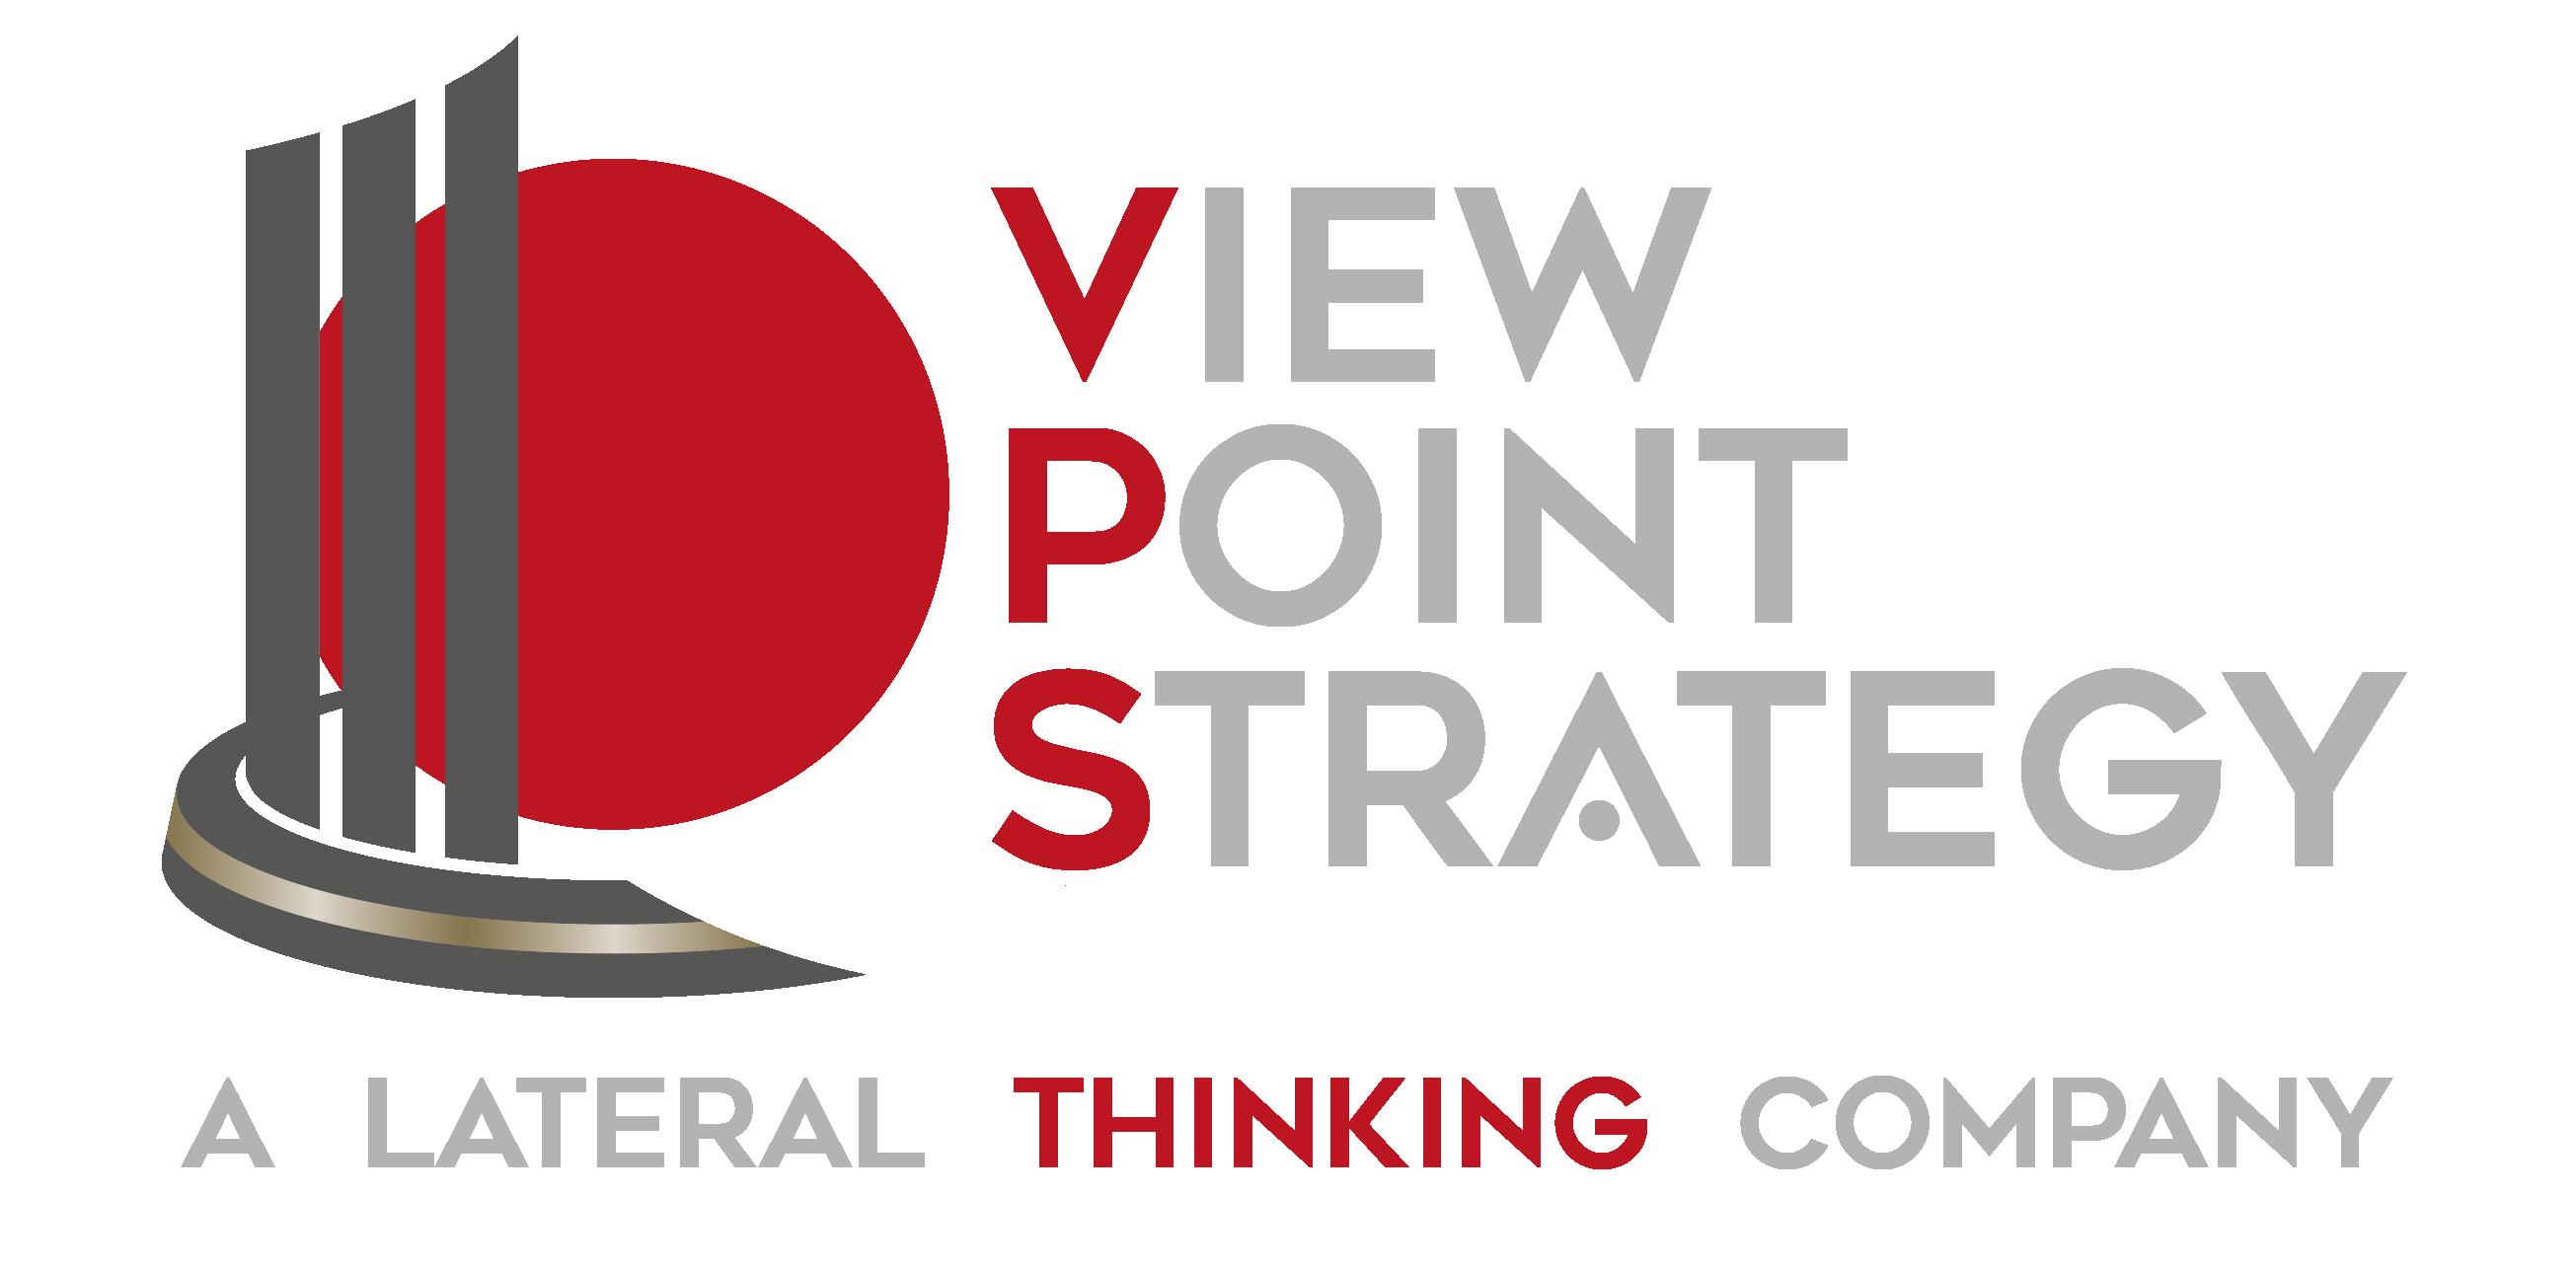 viewpointstrategy logo